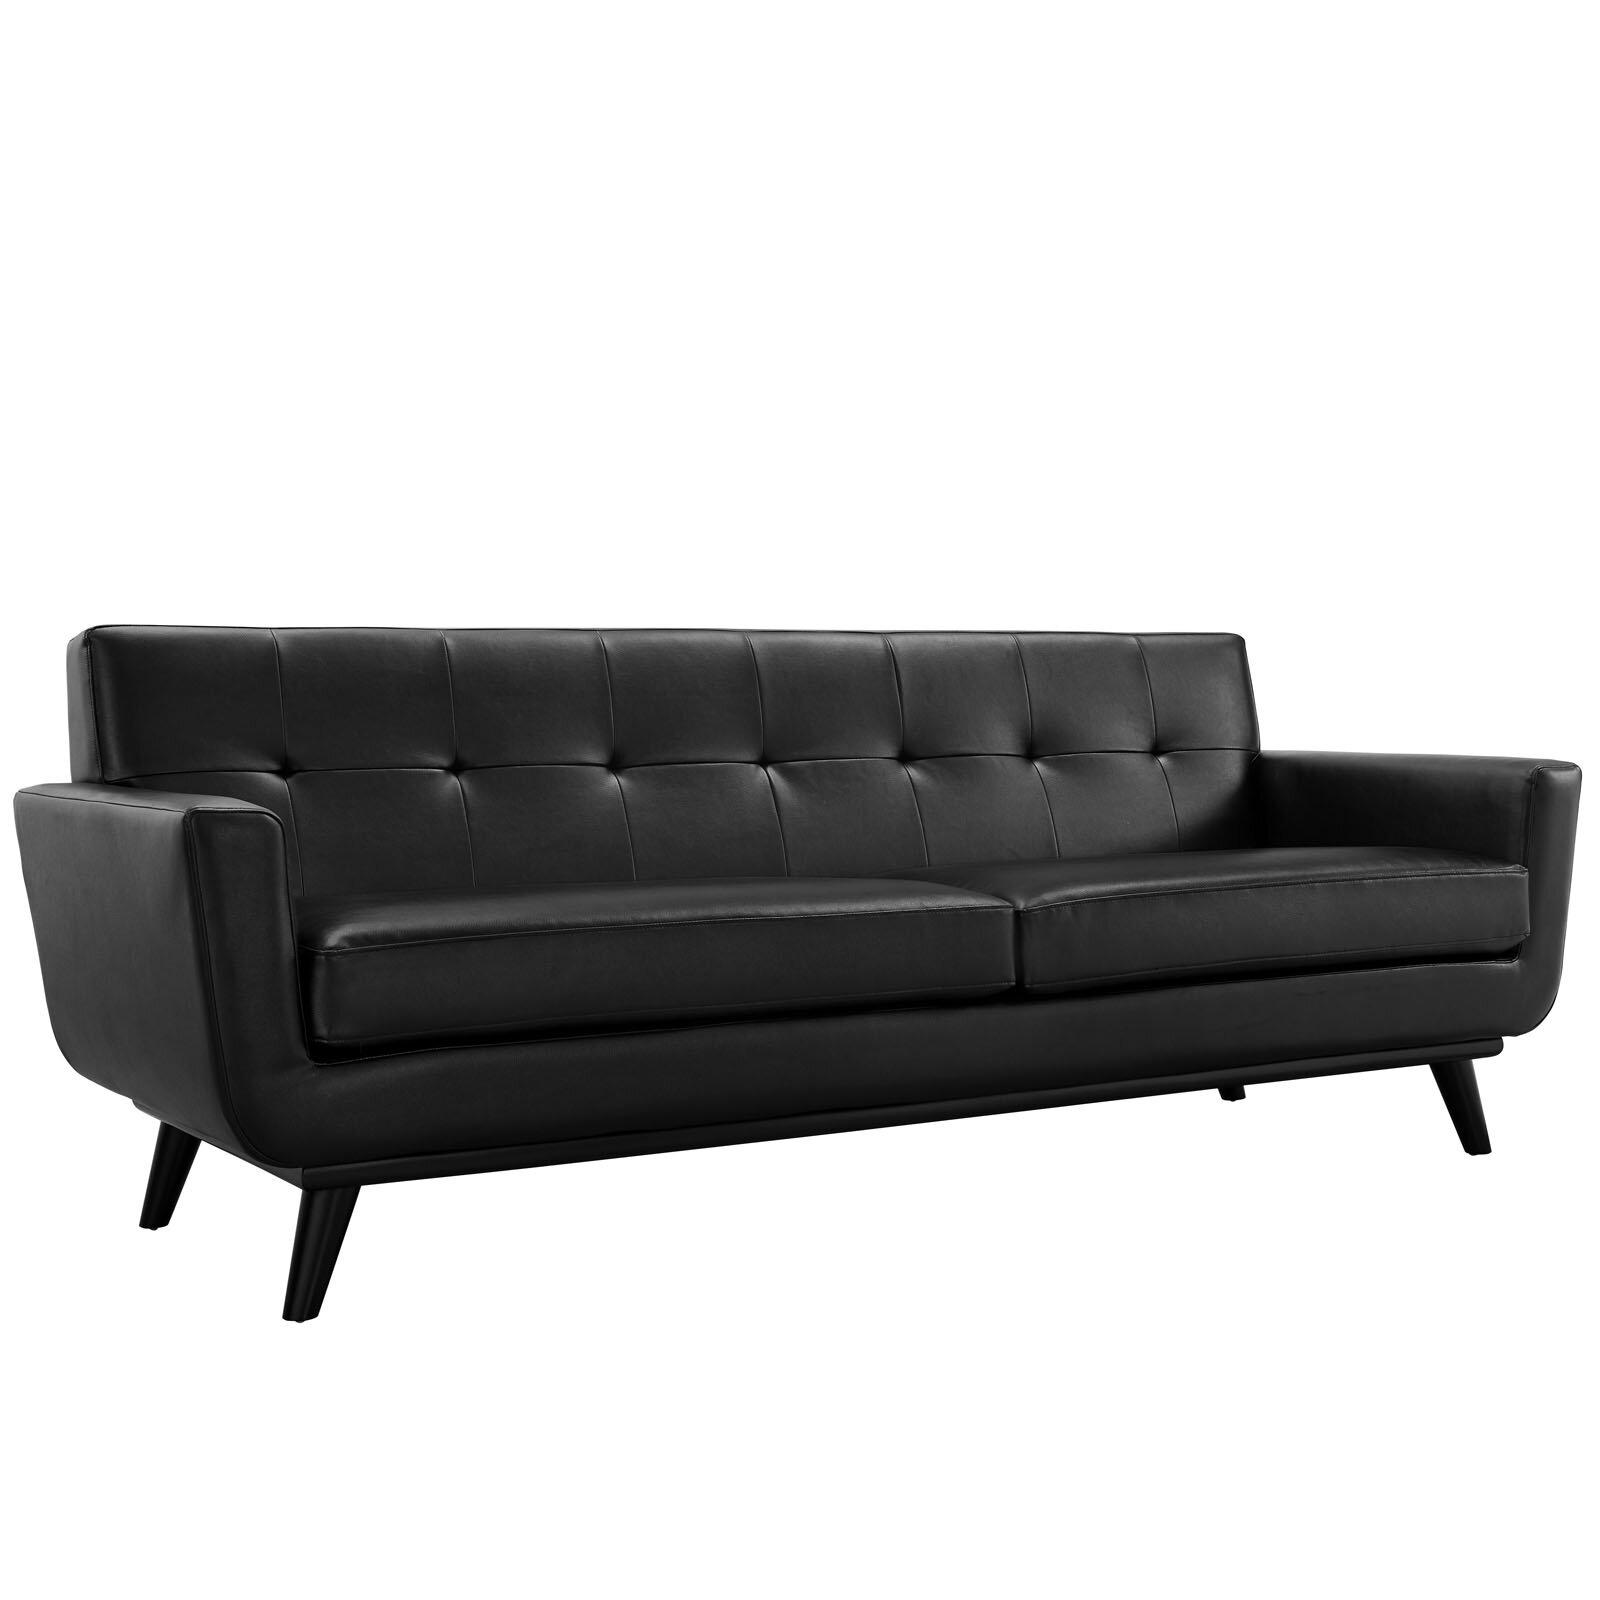 ektorp sofa reviews Sofa Hpricot